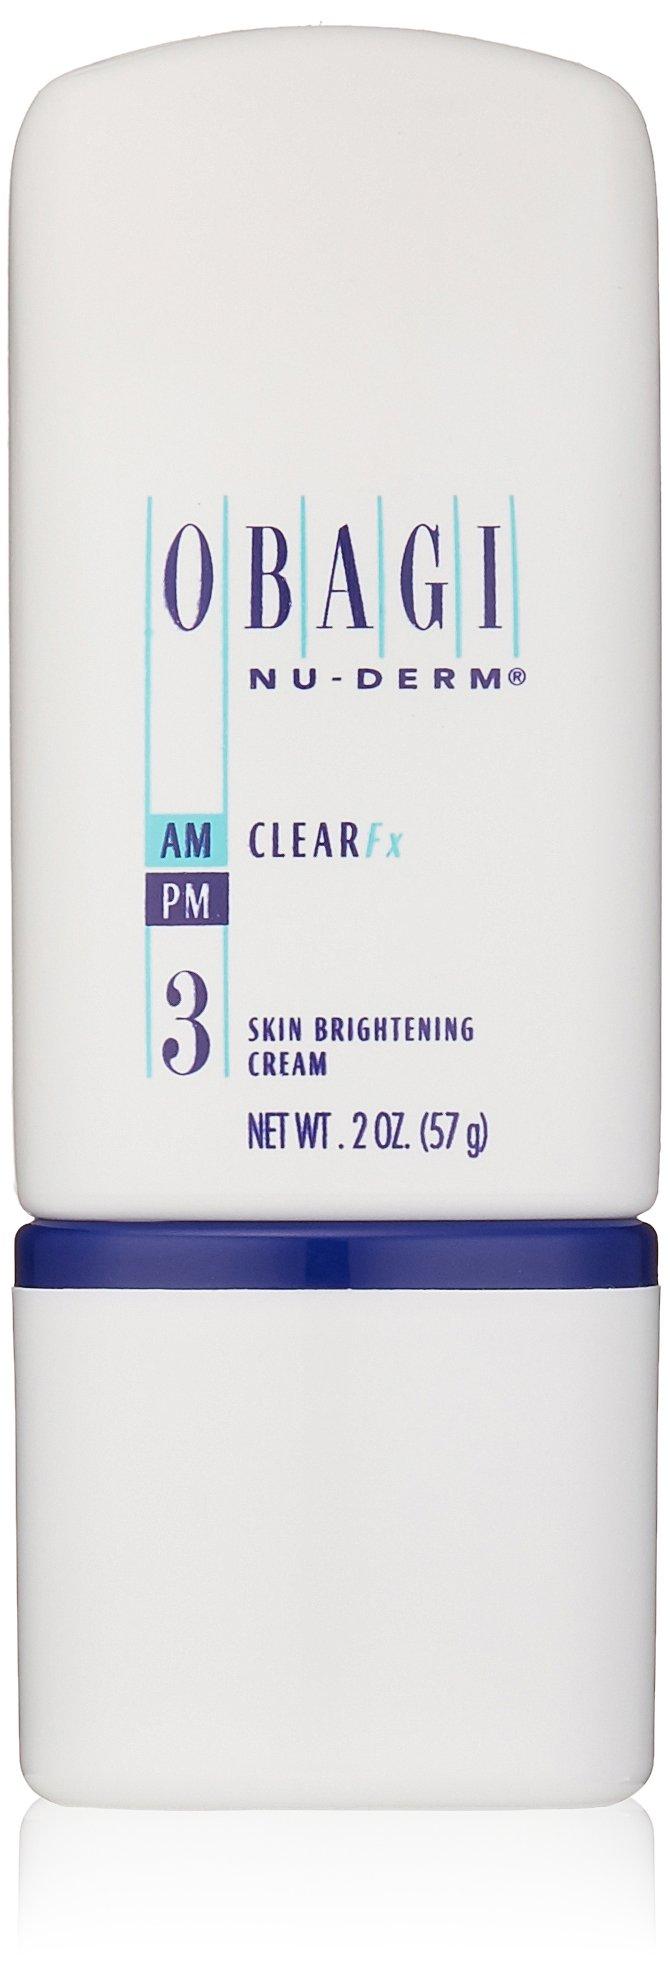 Obagi Nu-Derm Blend Skin Brightening Facial Treatment, Step 5, 2 Oz Mavala Protect and Repair Lip Balm, 4.5 Gram